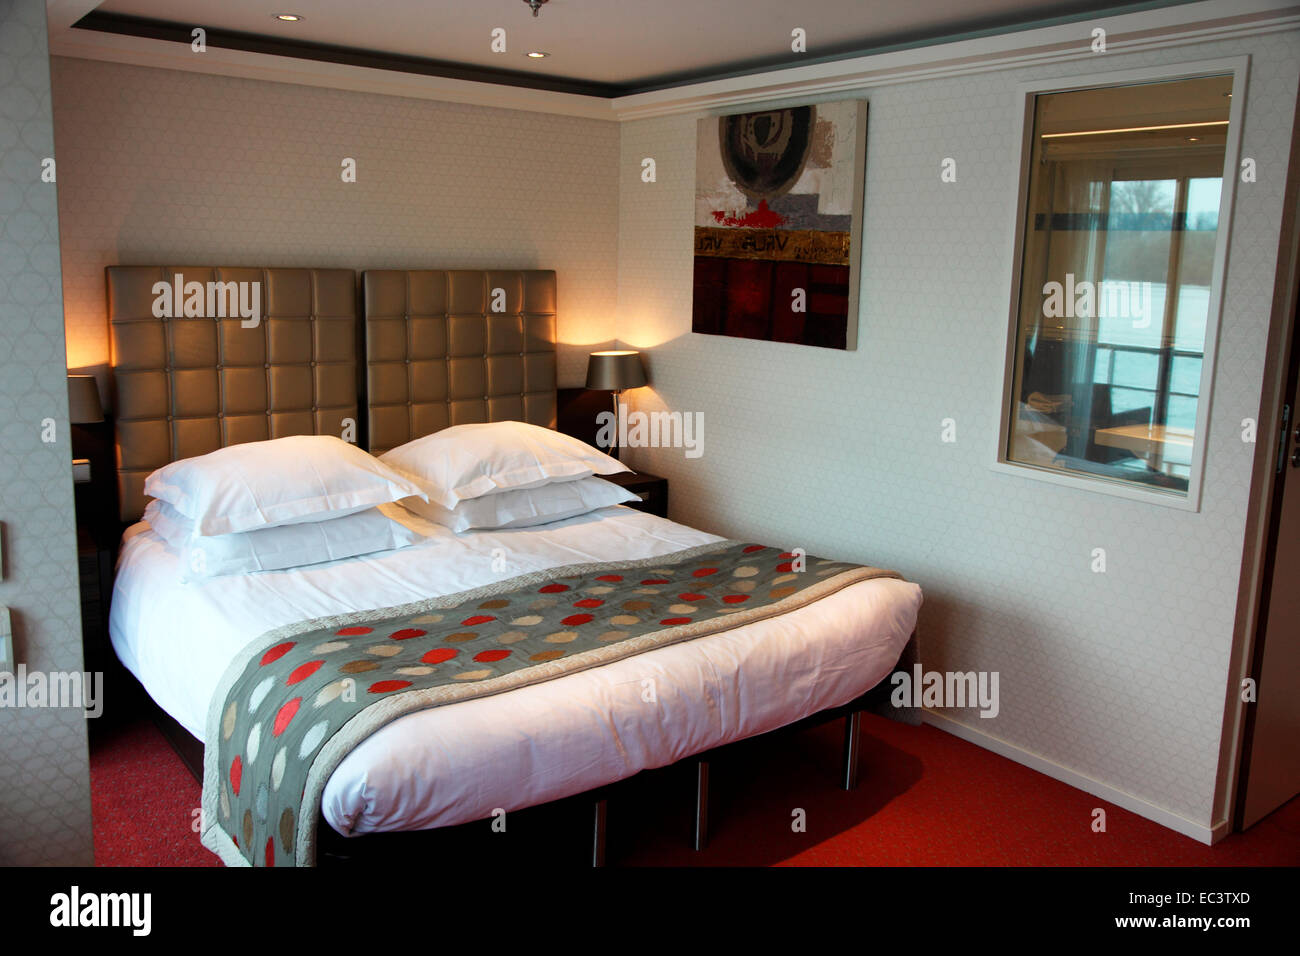 Stateroom Stockfotos & Stateroom Bilder - Alamy